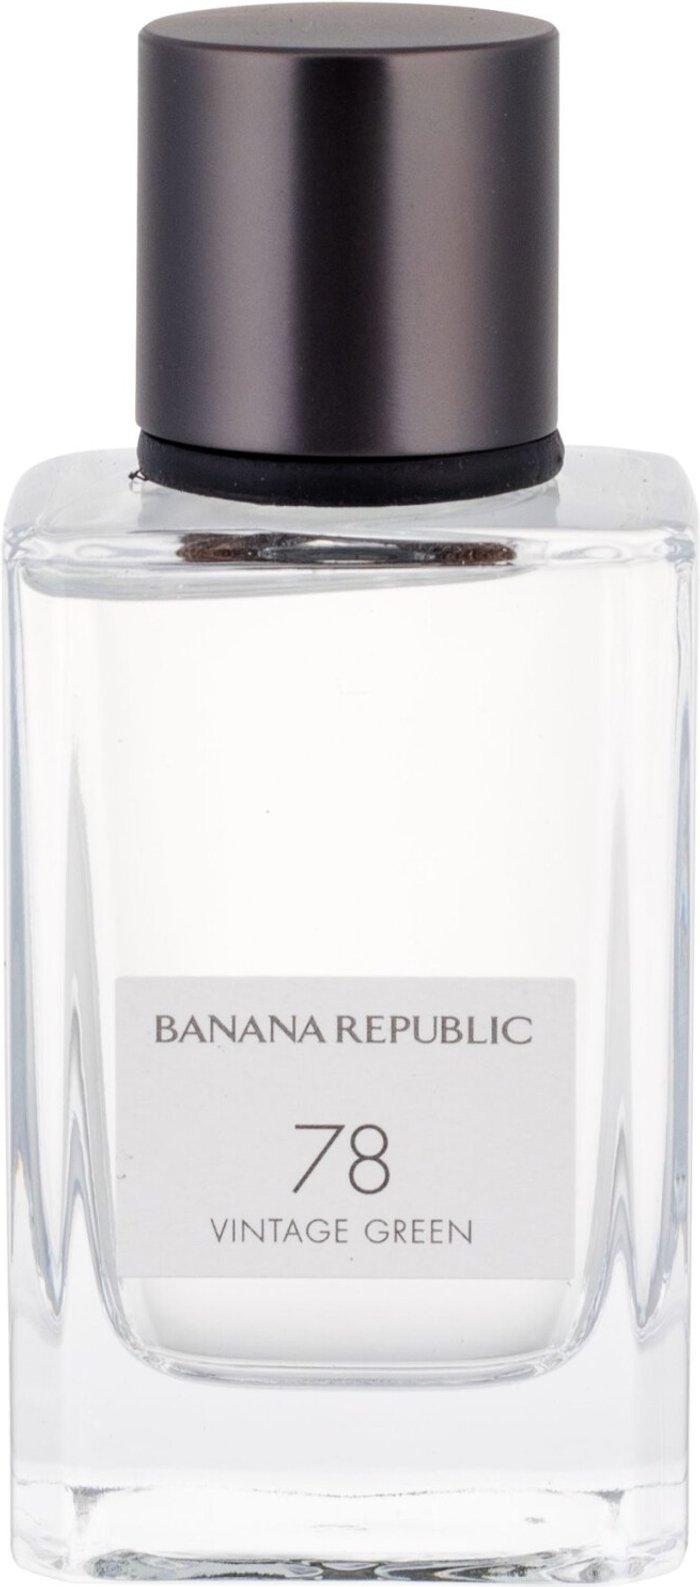 Banana Republic Banana Republic 78 Vintage Green Eau de Parfum